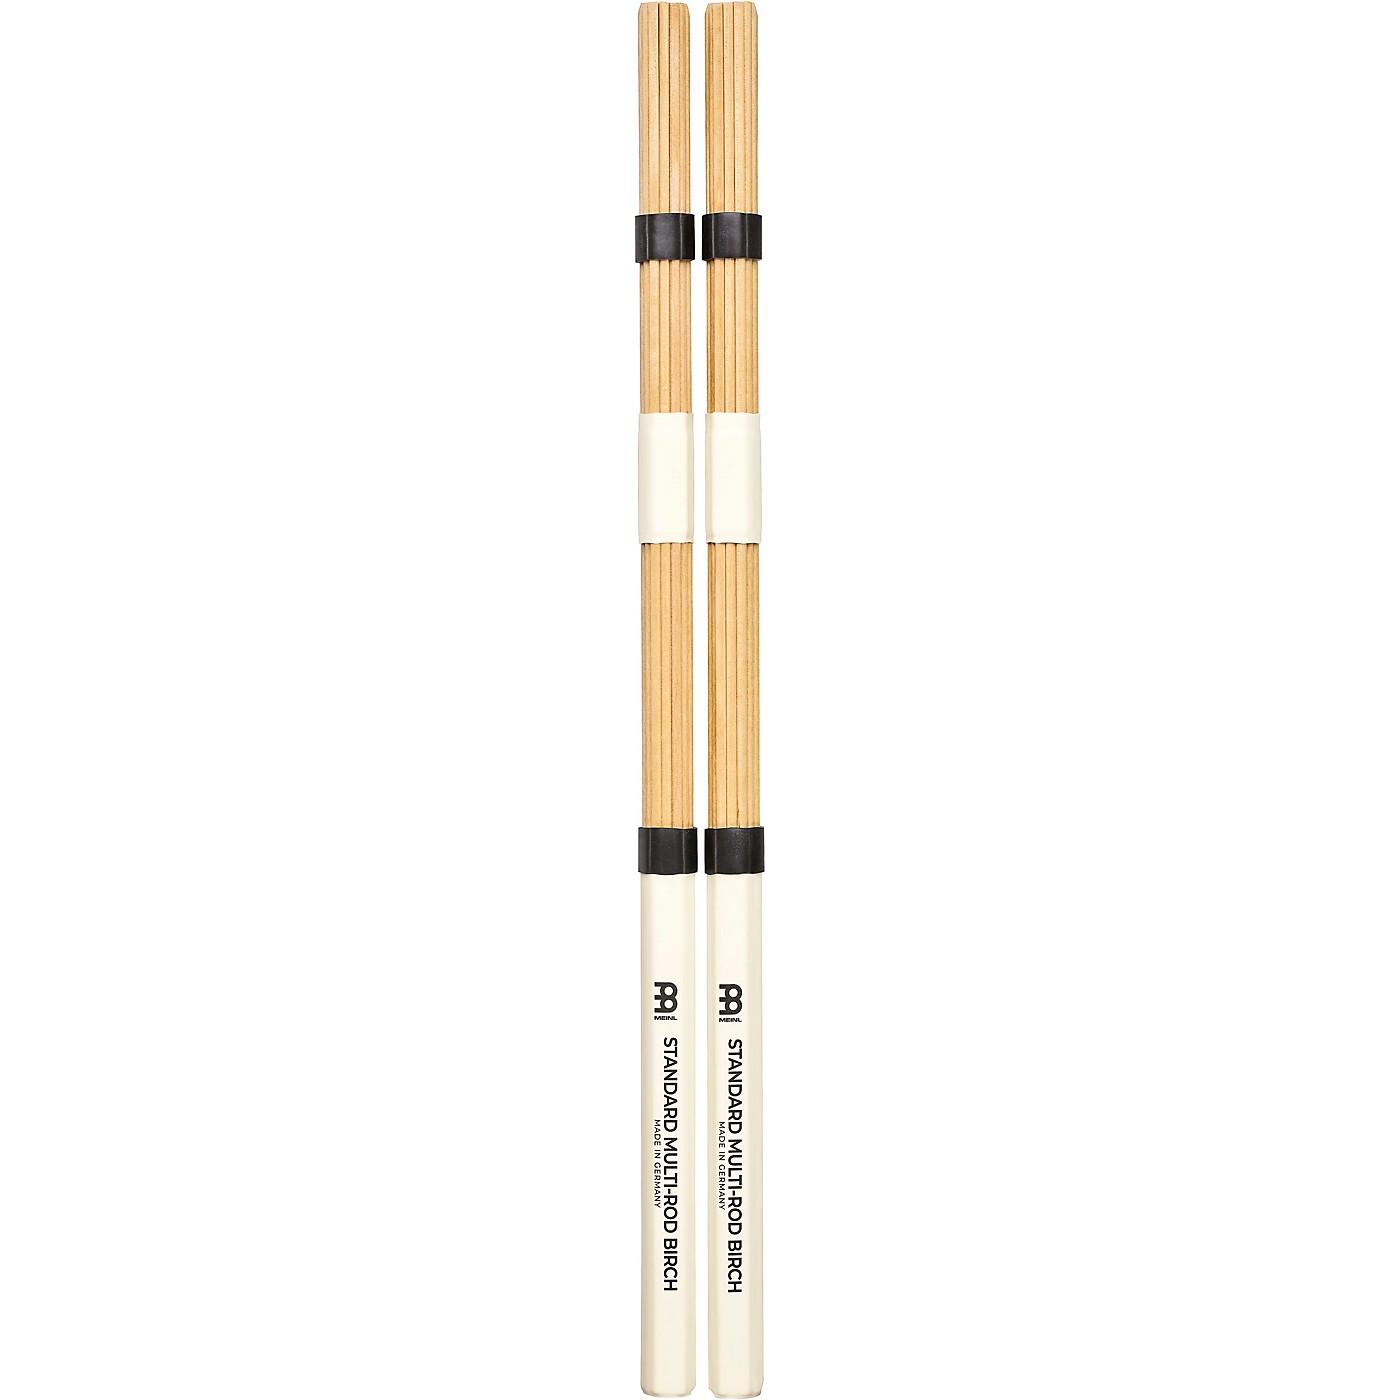 Meinl Stick & Brush Bamboo Flex Multi-Rods thumbnail